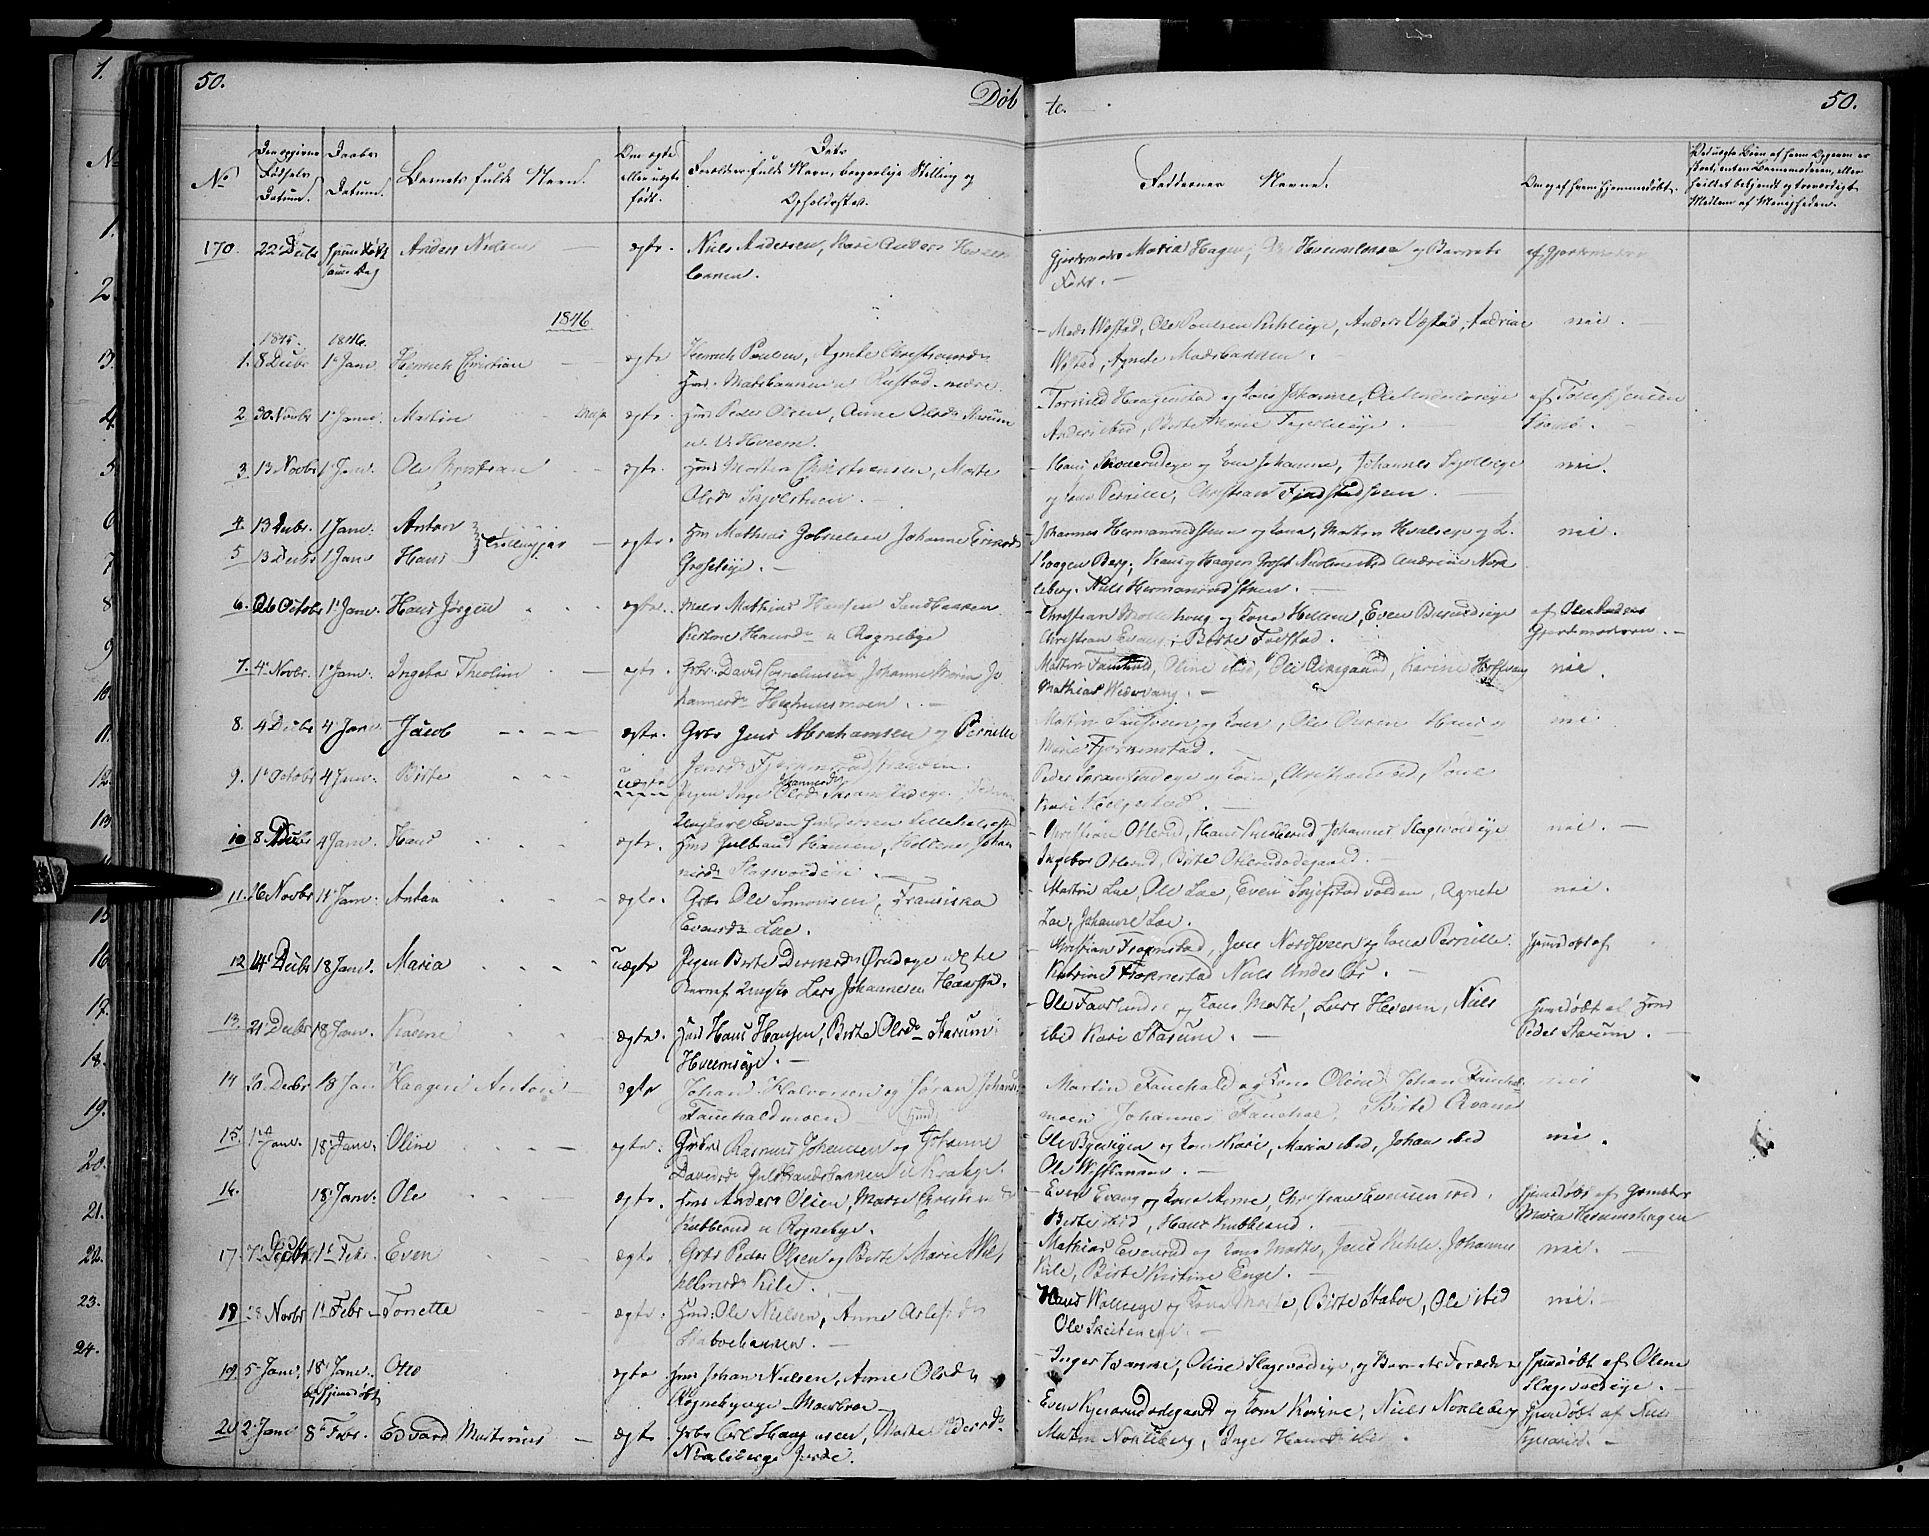 SAH, Østre Toten prestekontor, Ministerialbok nr. 2, 1840-1847, s. 50